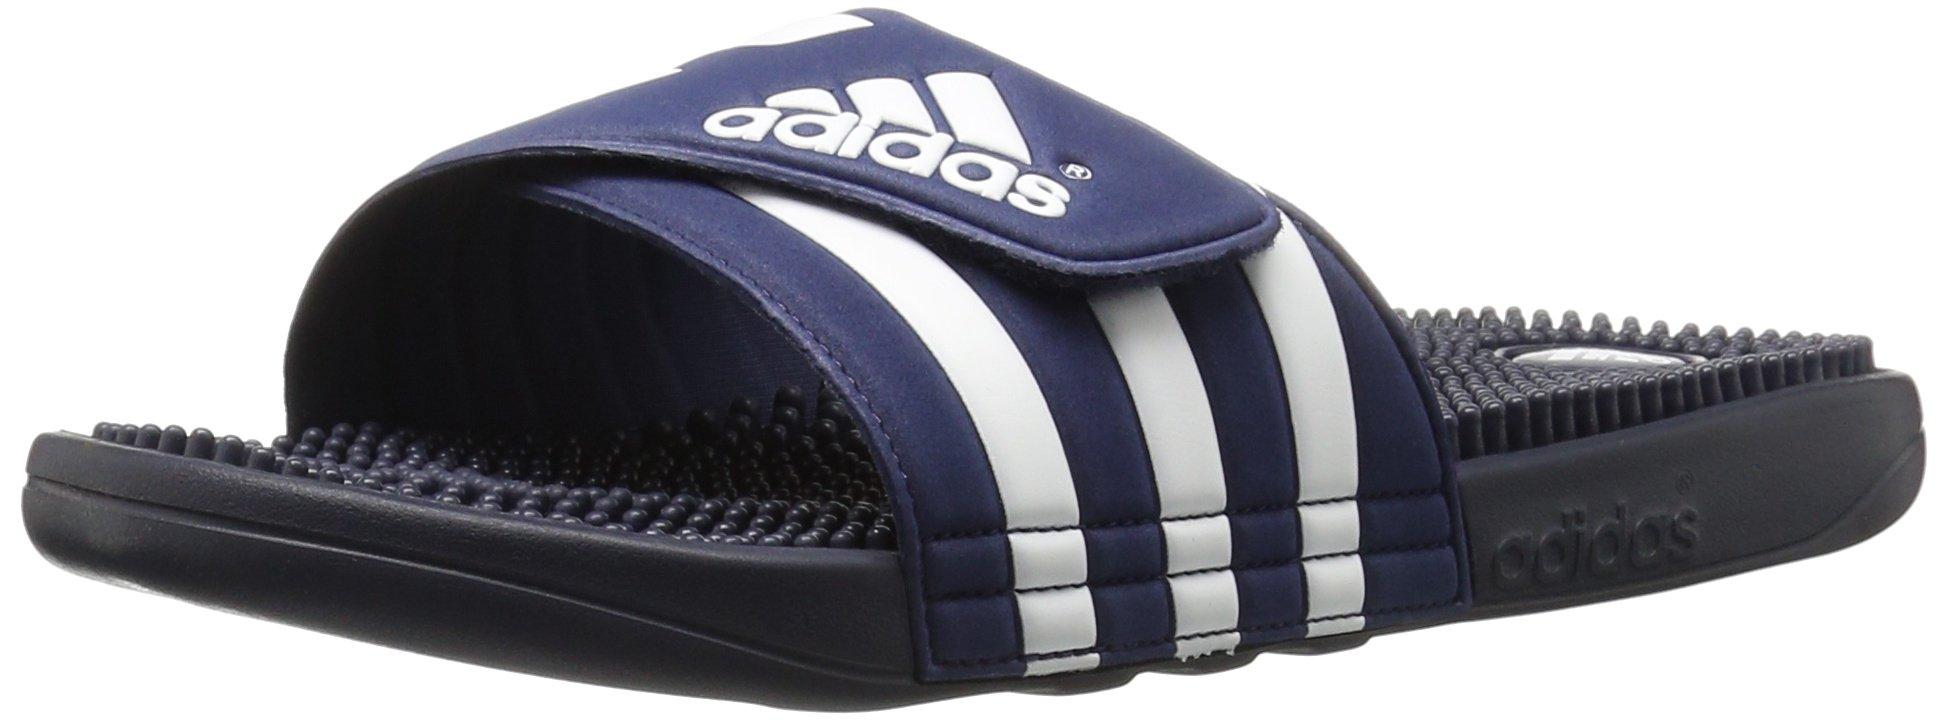 cdad828a75723b adidas Men s Adissage Sandal